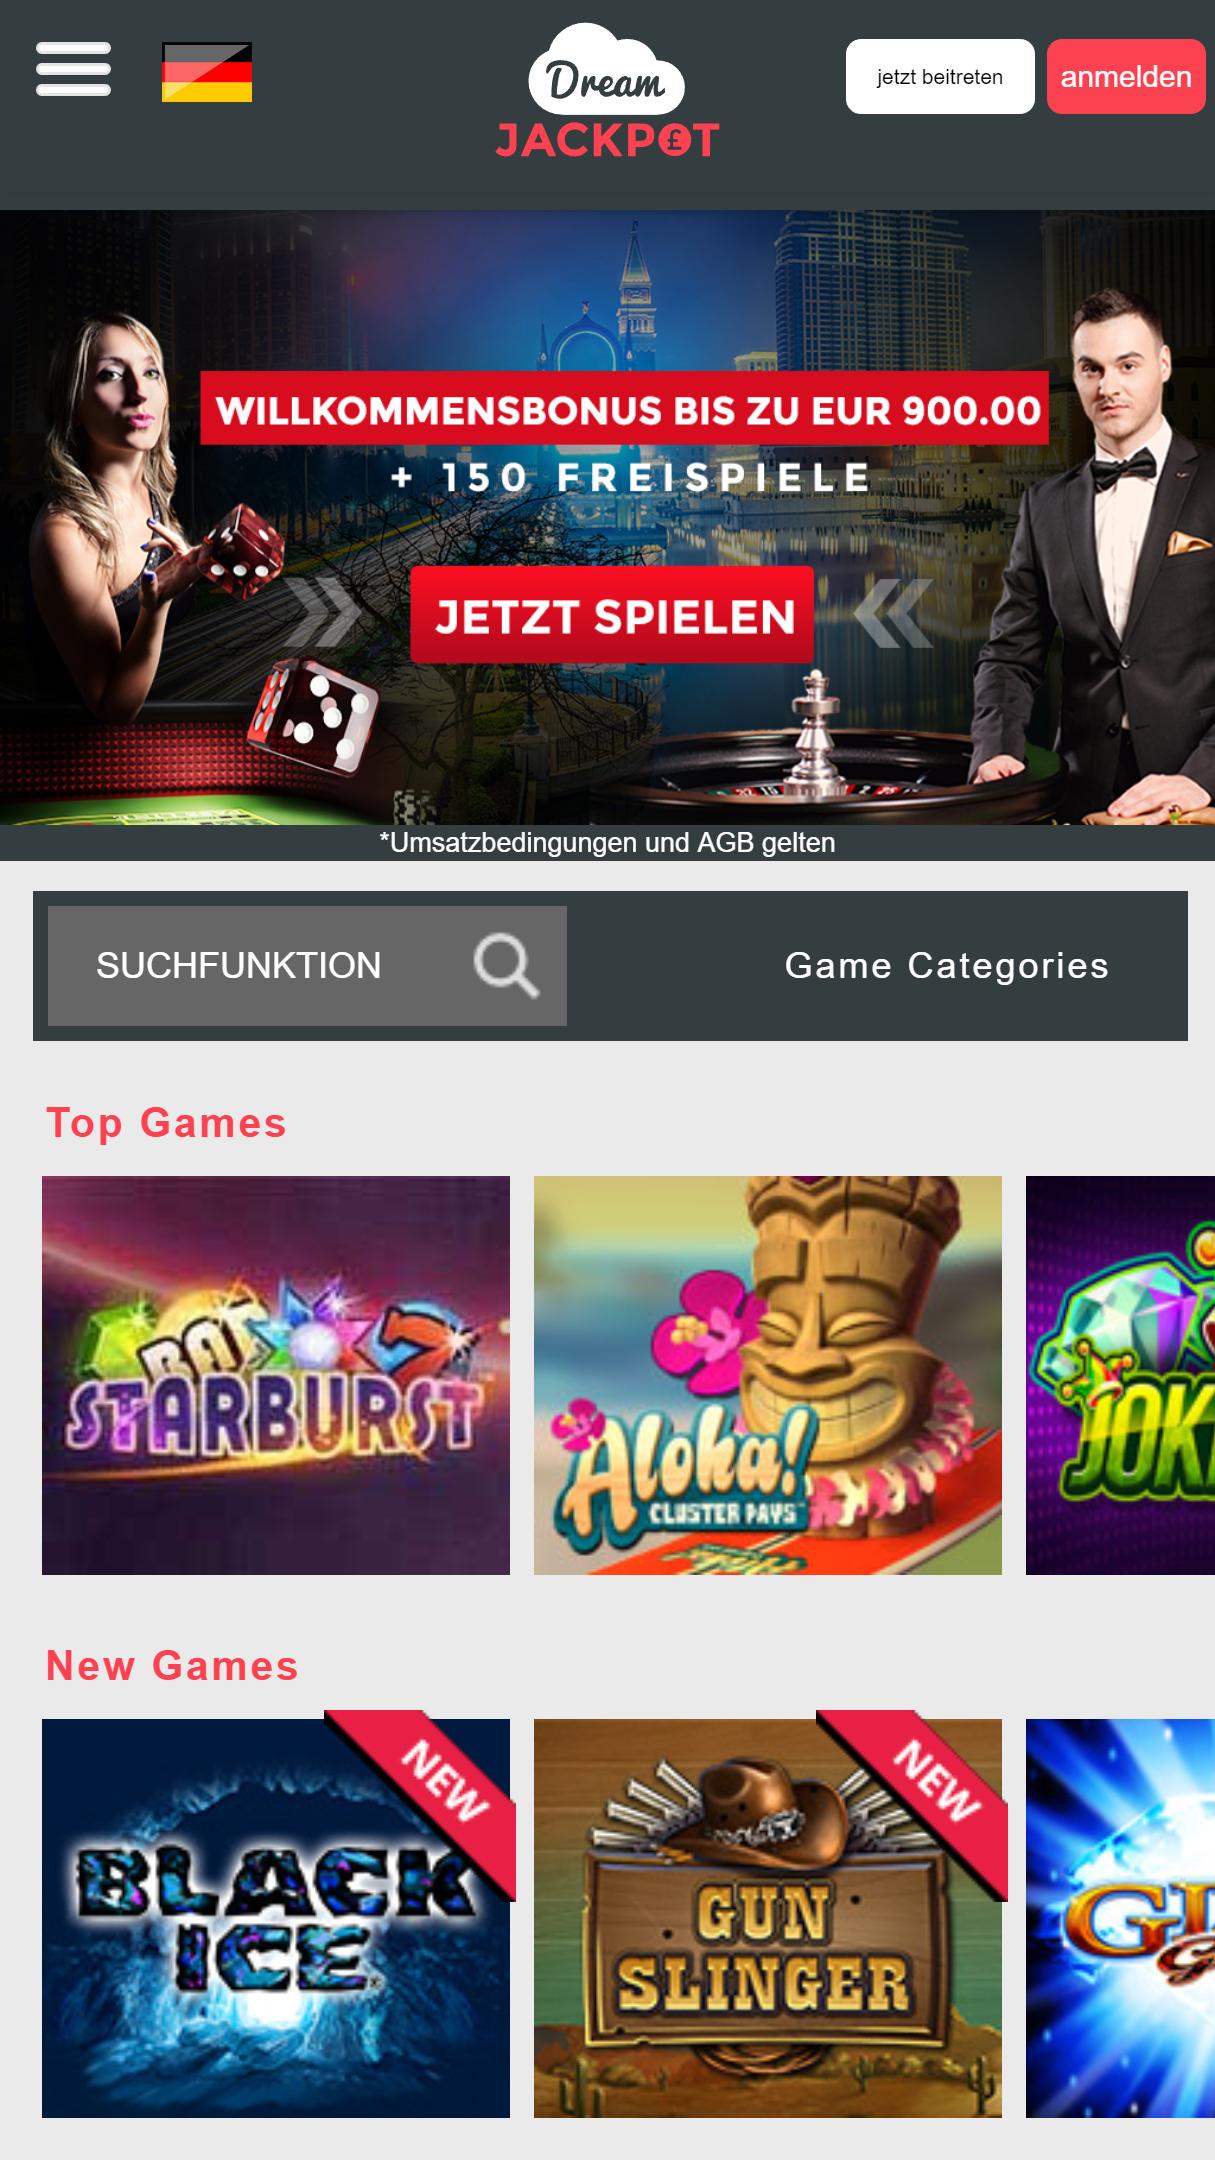 Dream Jackpot App Homepage